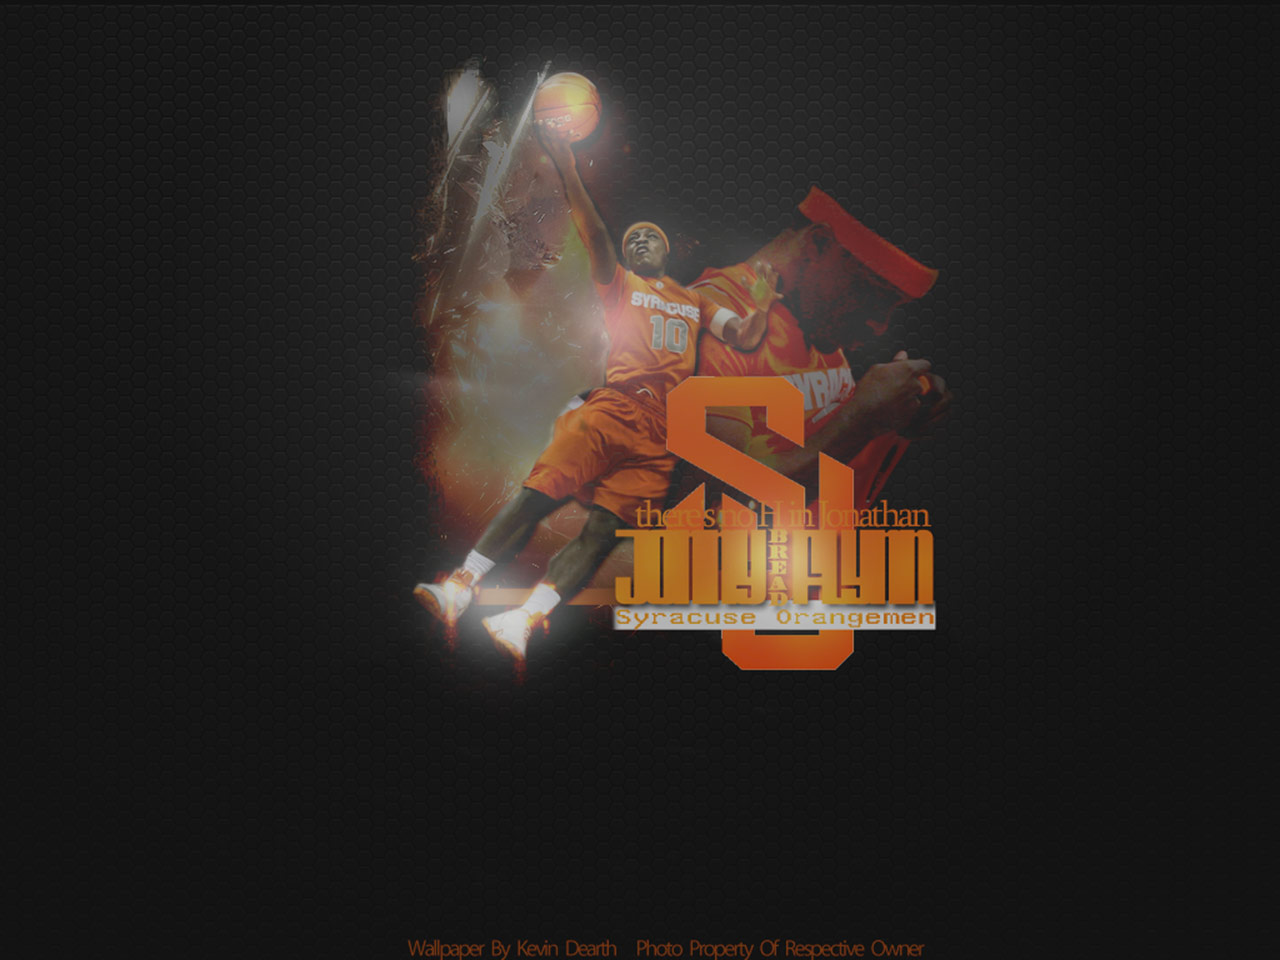 Jonny Flynn Syracuse Orange Wallpaper Basketball 1280x960